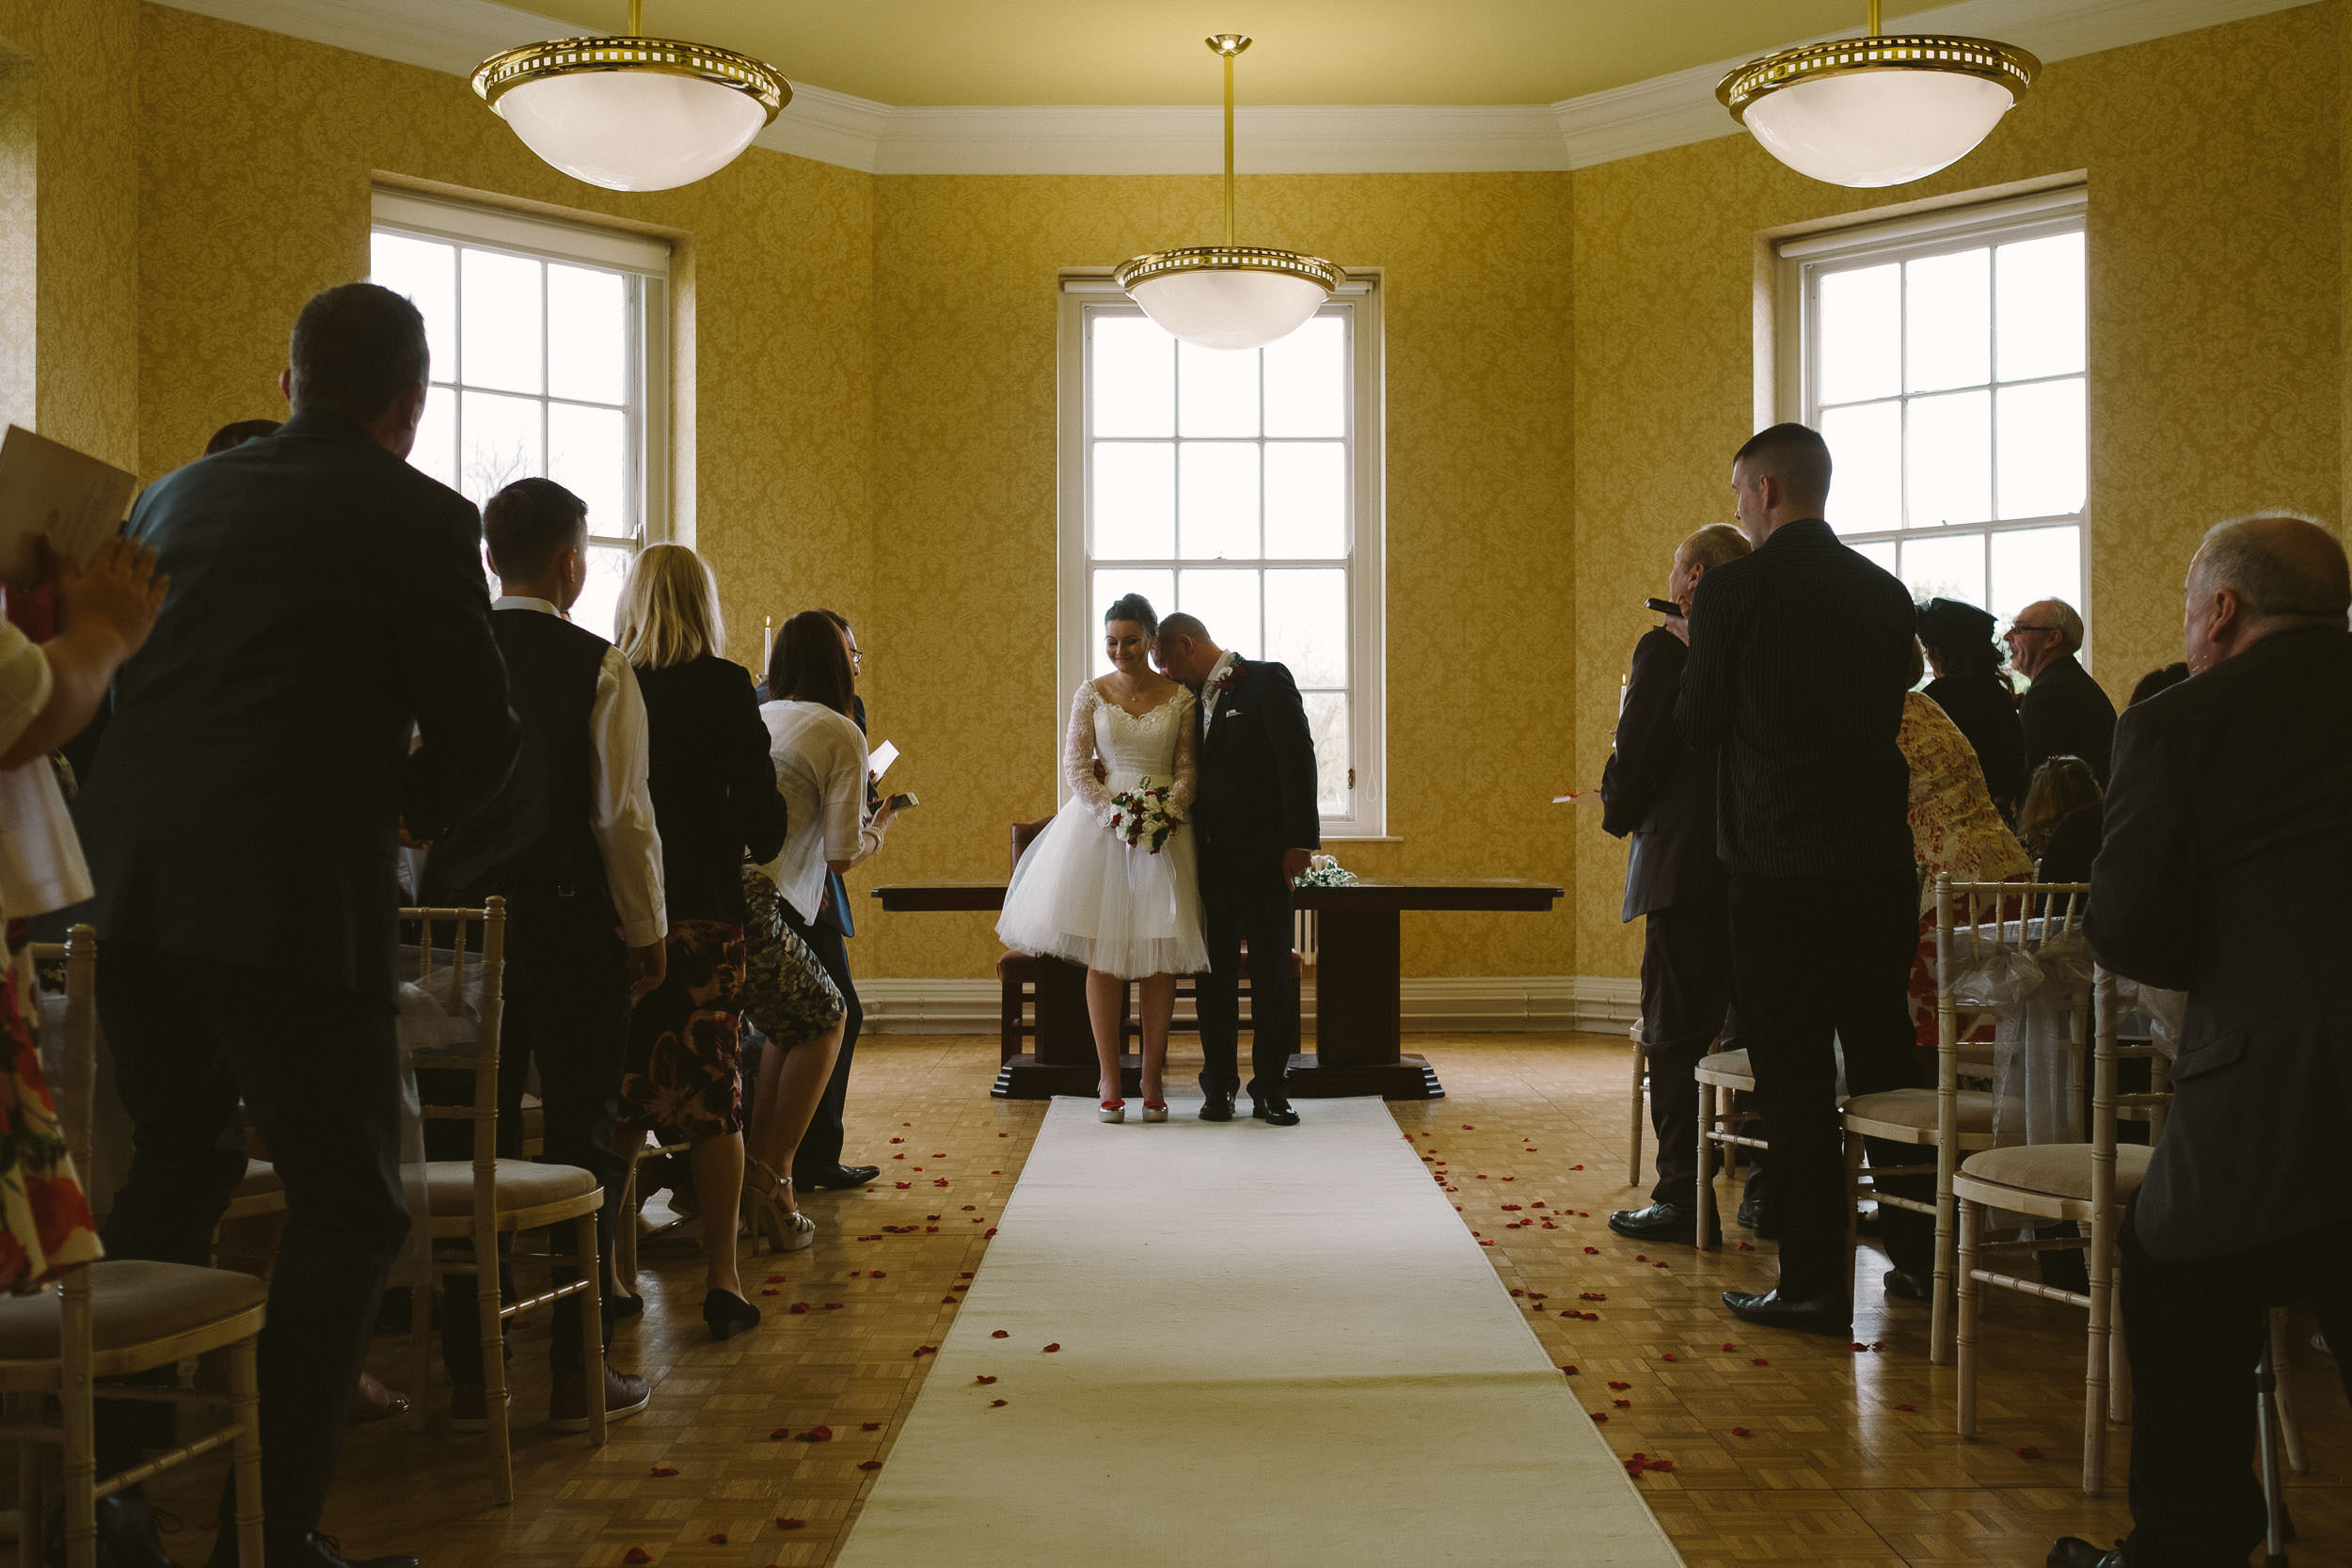 Groom nuzzles brides neck at end of wedding ceremony